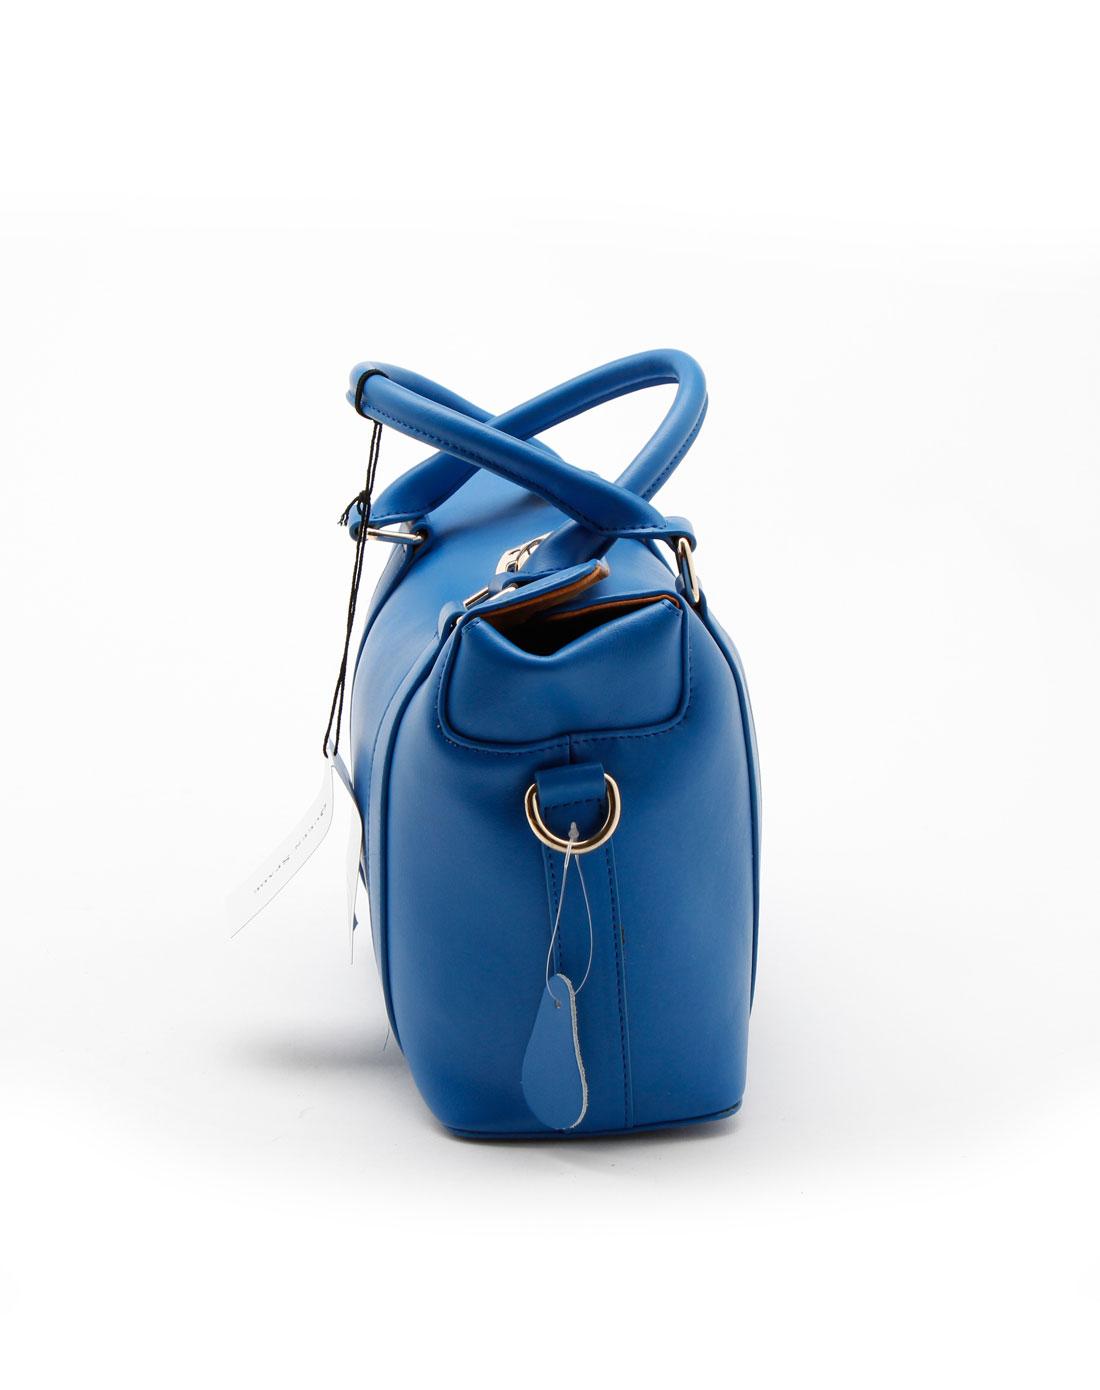 spade时尚蓝色手提包q8789